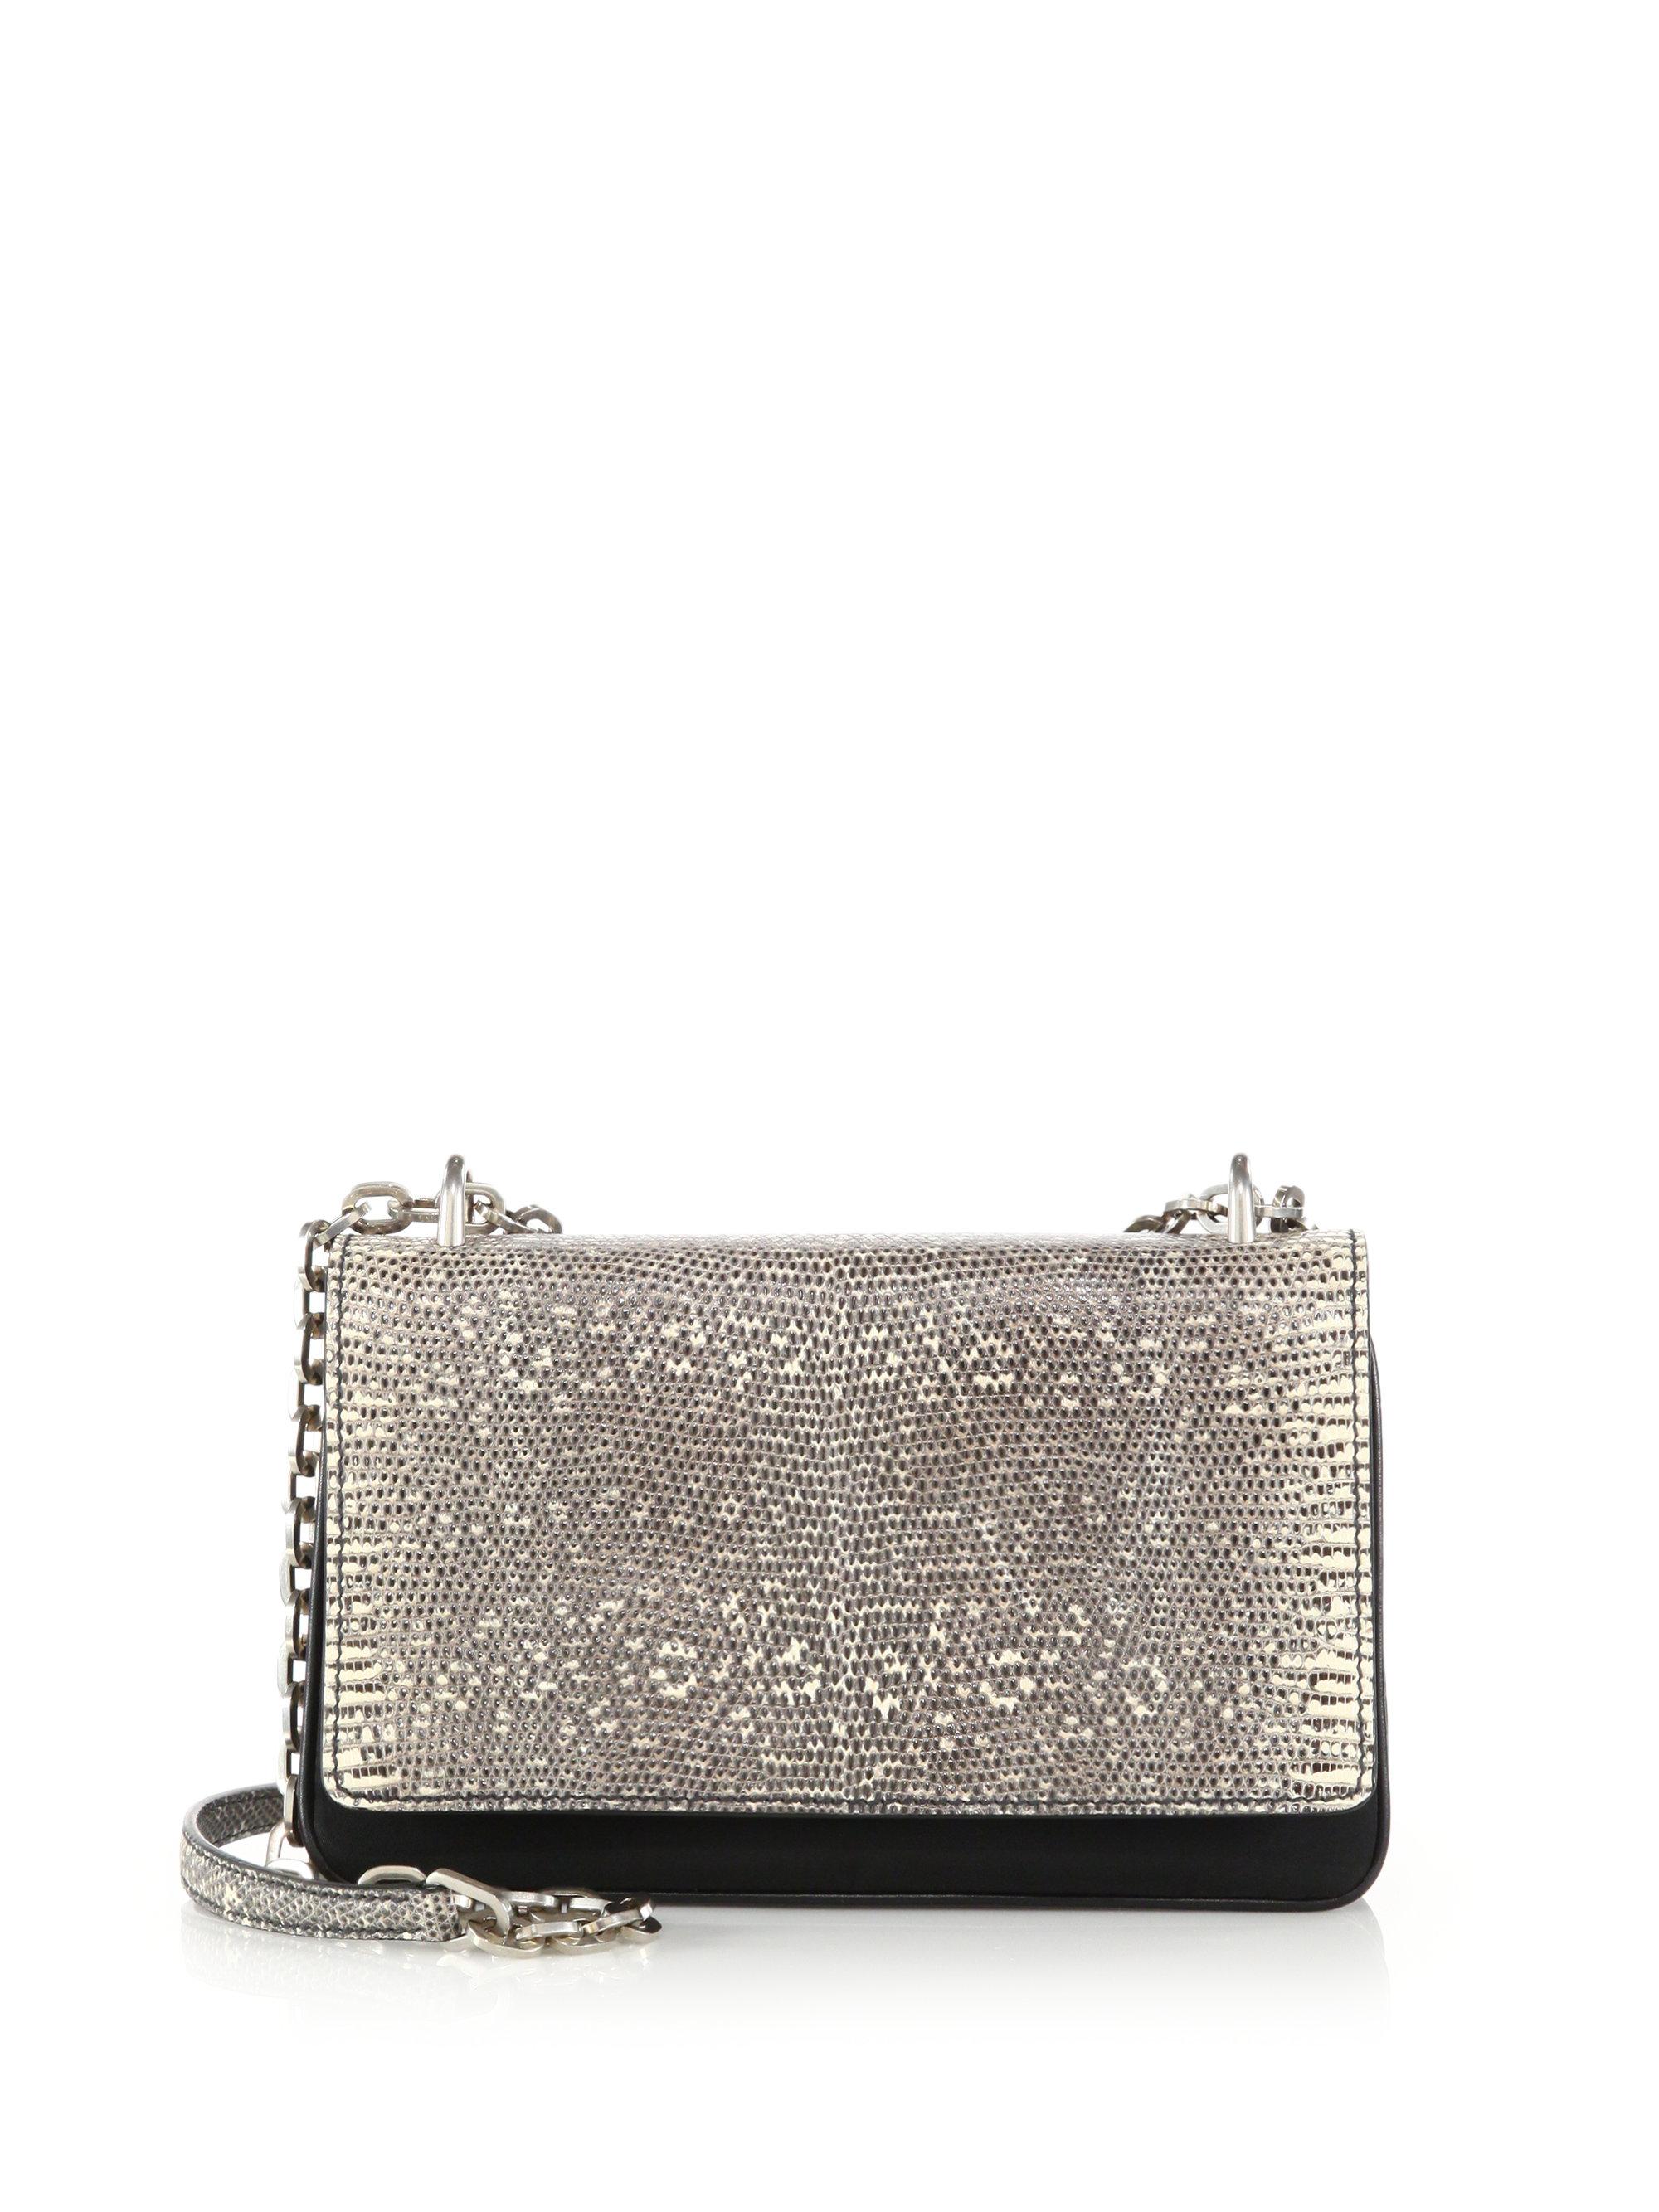 Prada Tessuto \u0026amp; Lizard Crossbody Bag in Silver (black-natural)   Lyst